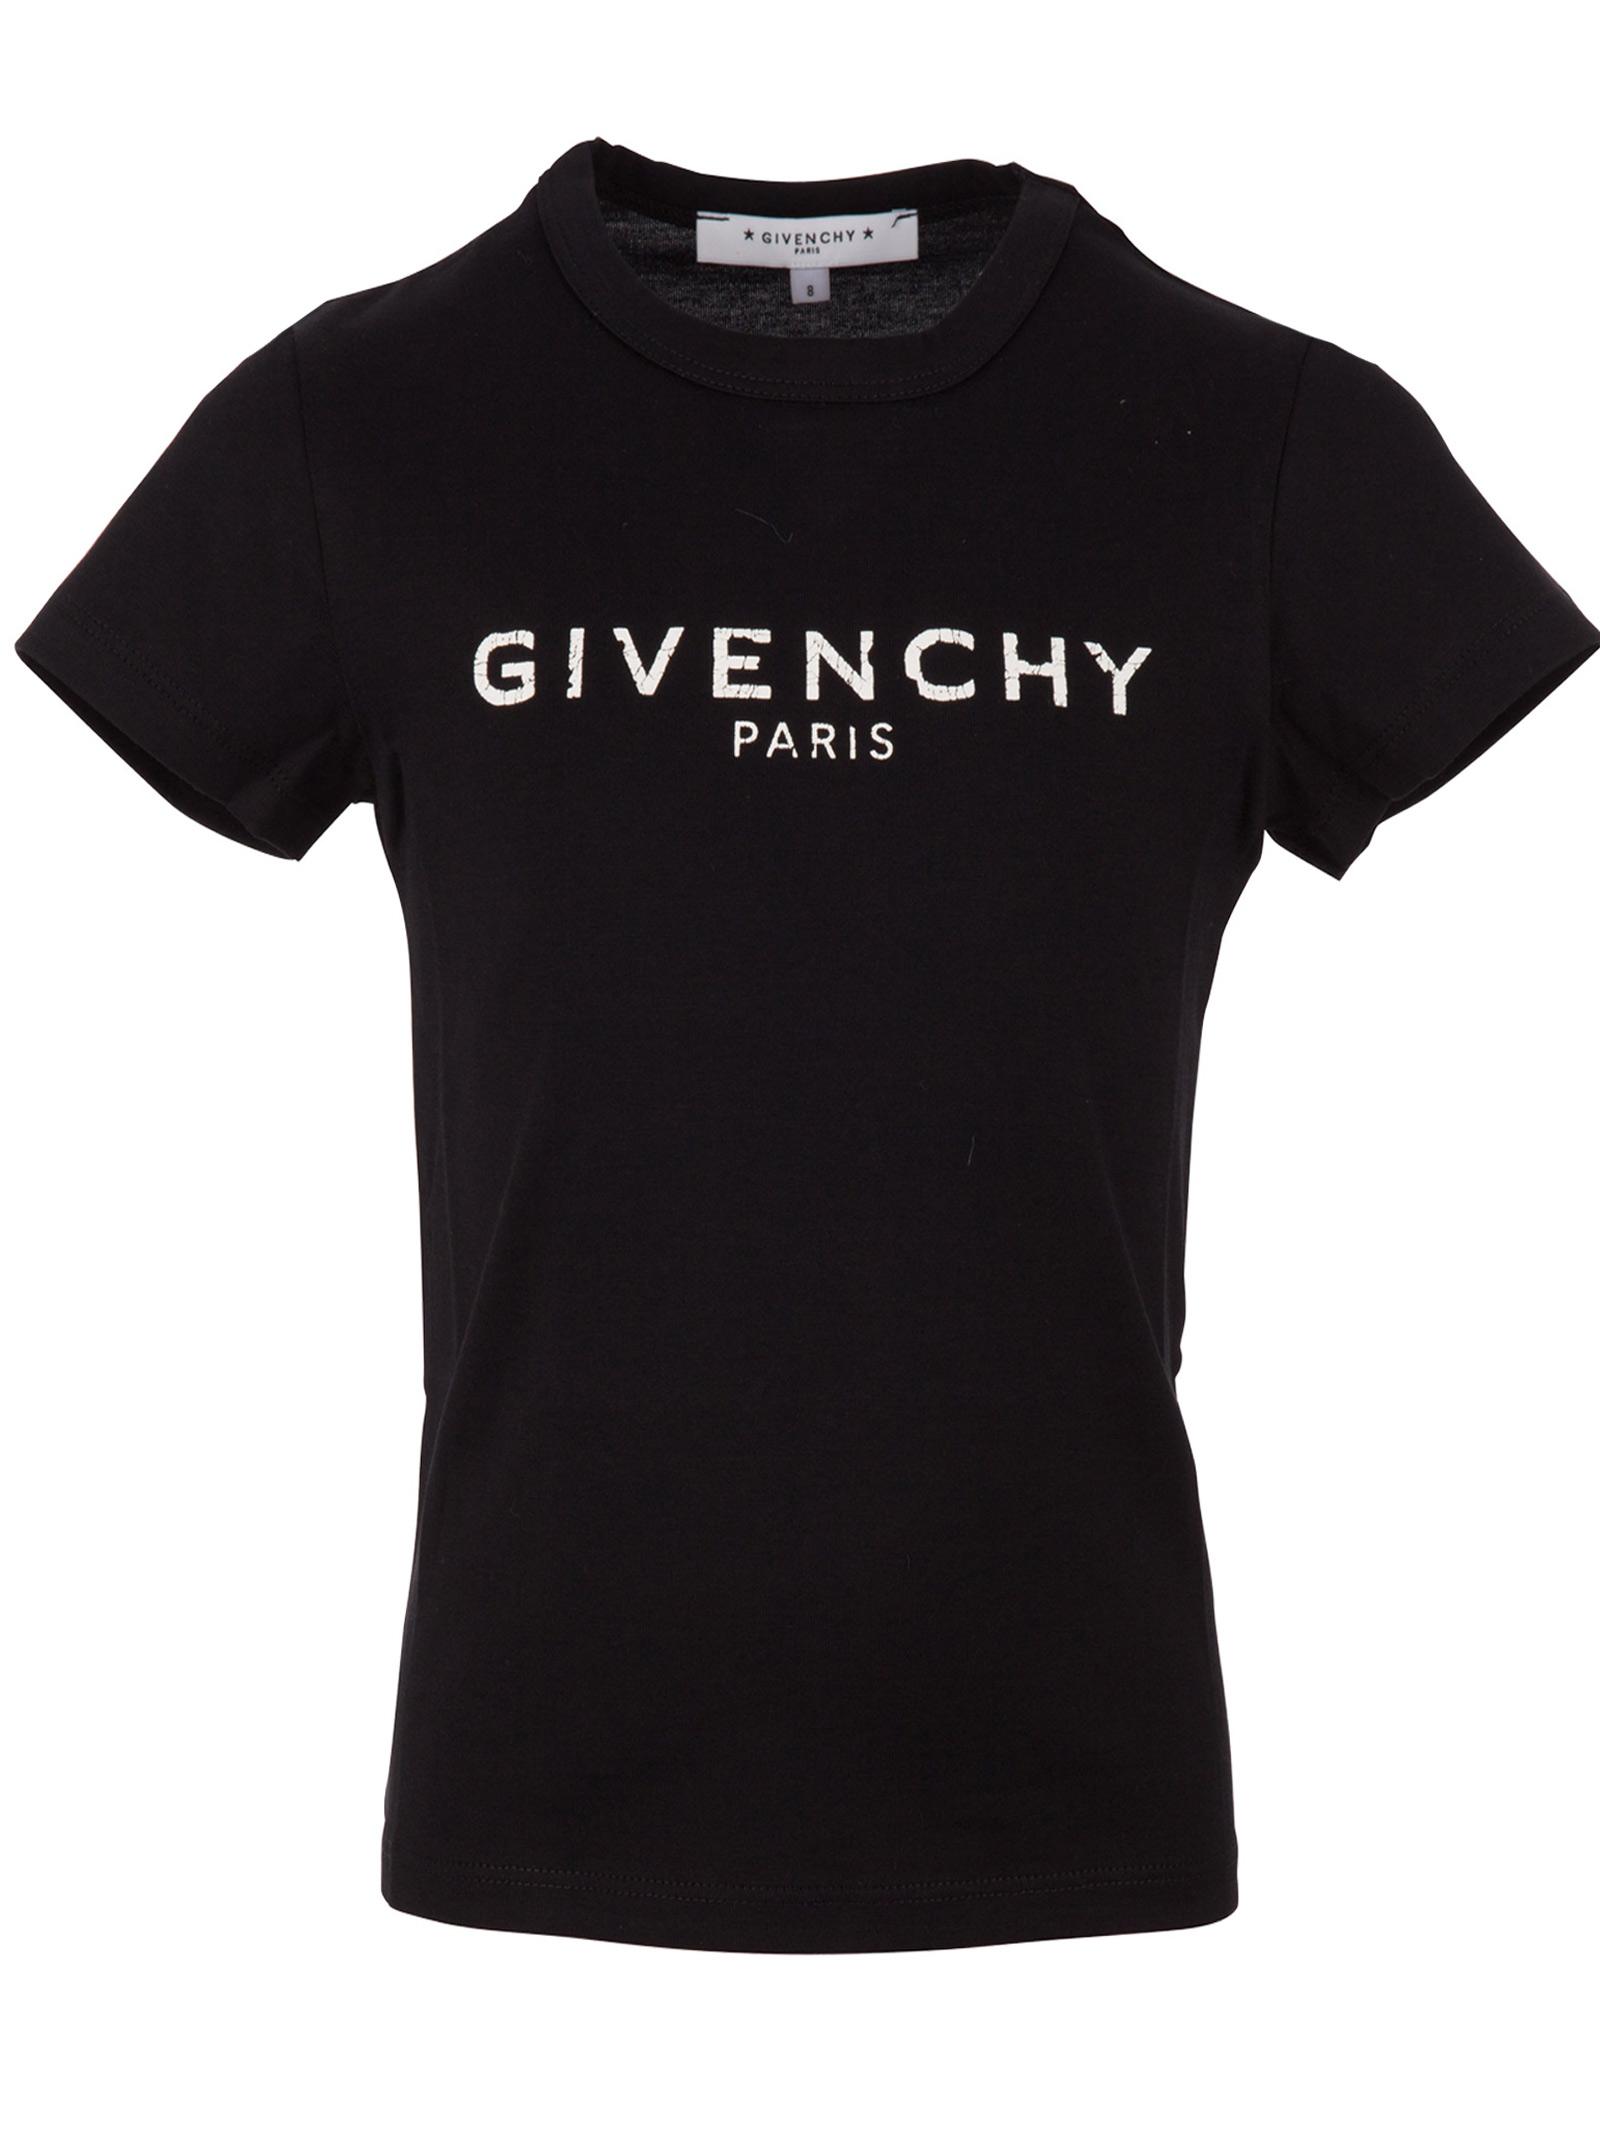 1fb05631 Givenchy Kids t-shirt - GIVENCHY kids - Michele Franzese Moda